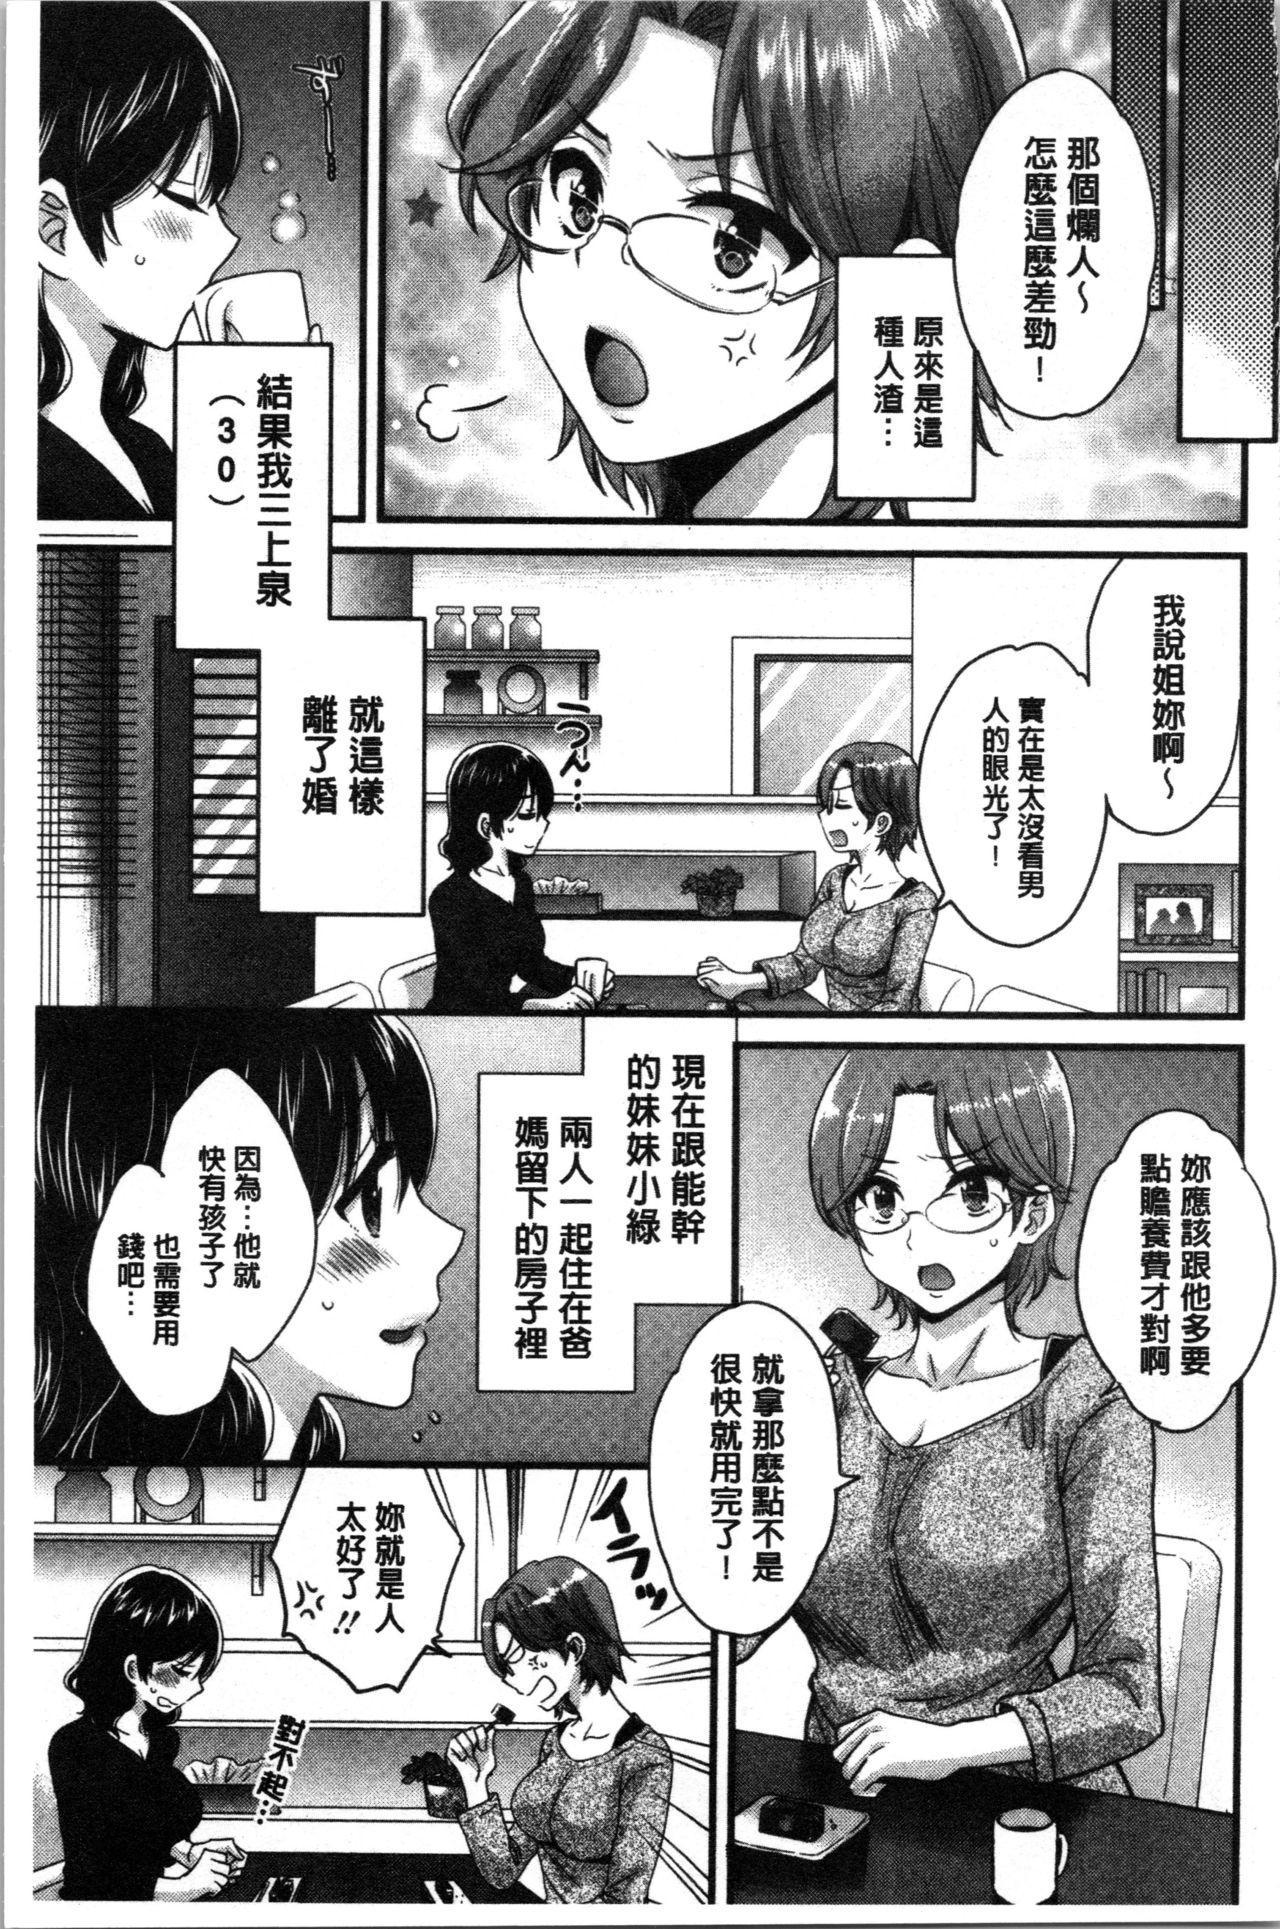 Ottori Midarana Mikami-san   嫻淑優雅又淫亂的三上小姐 7